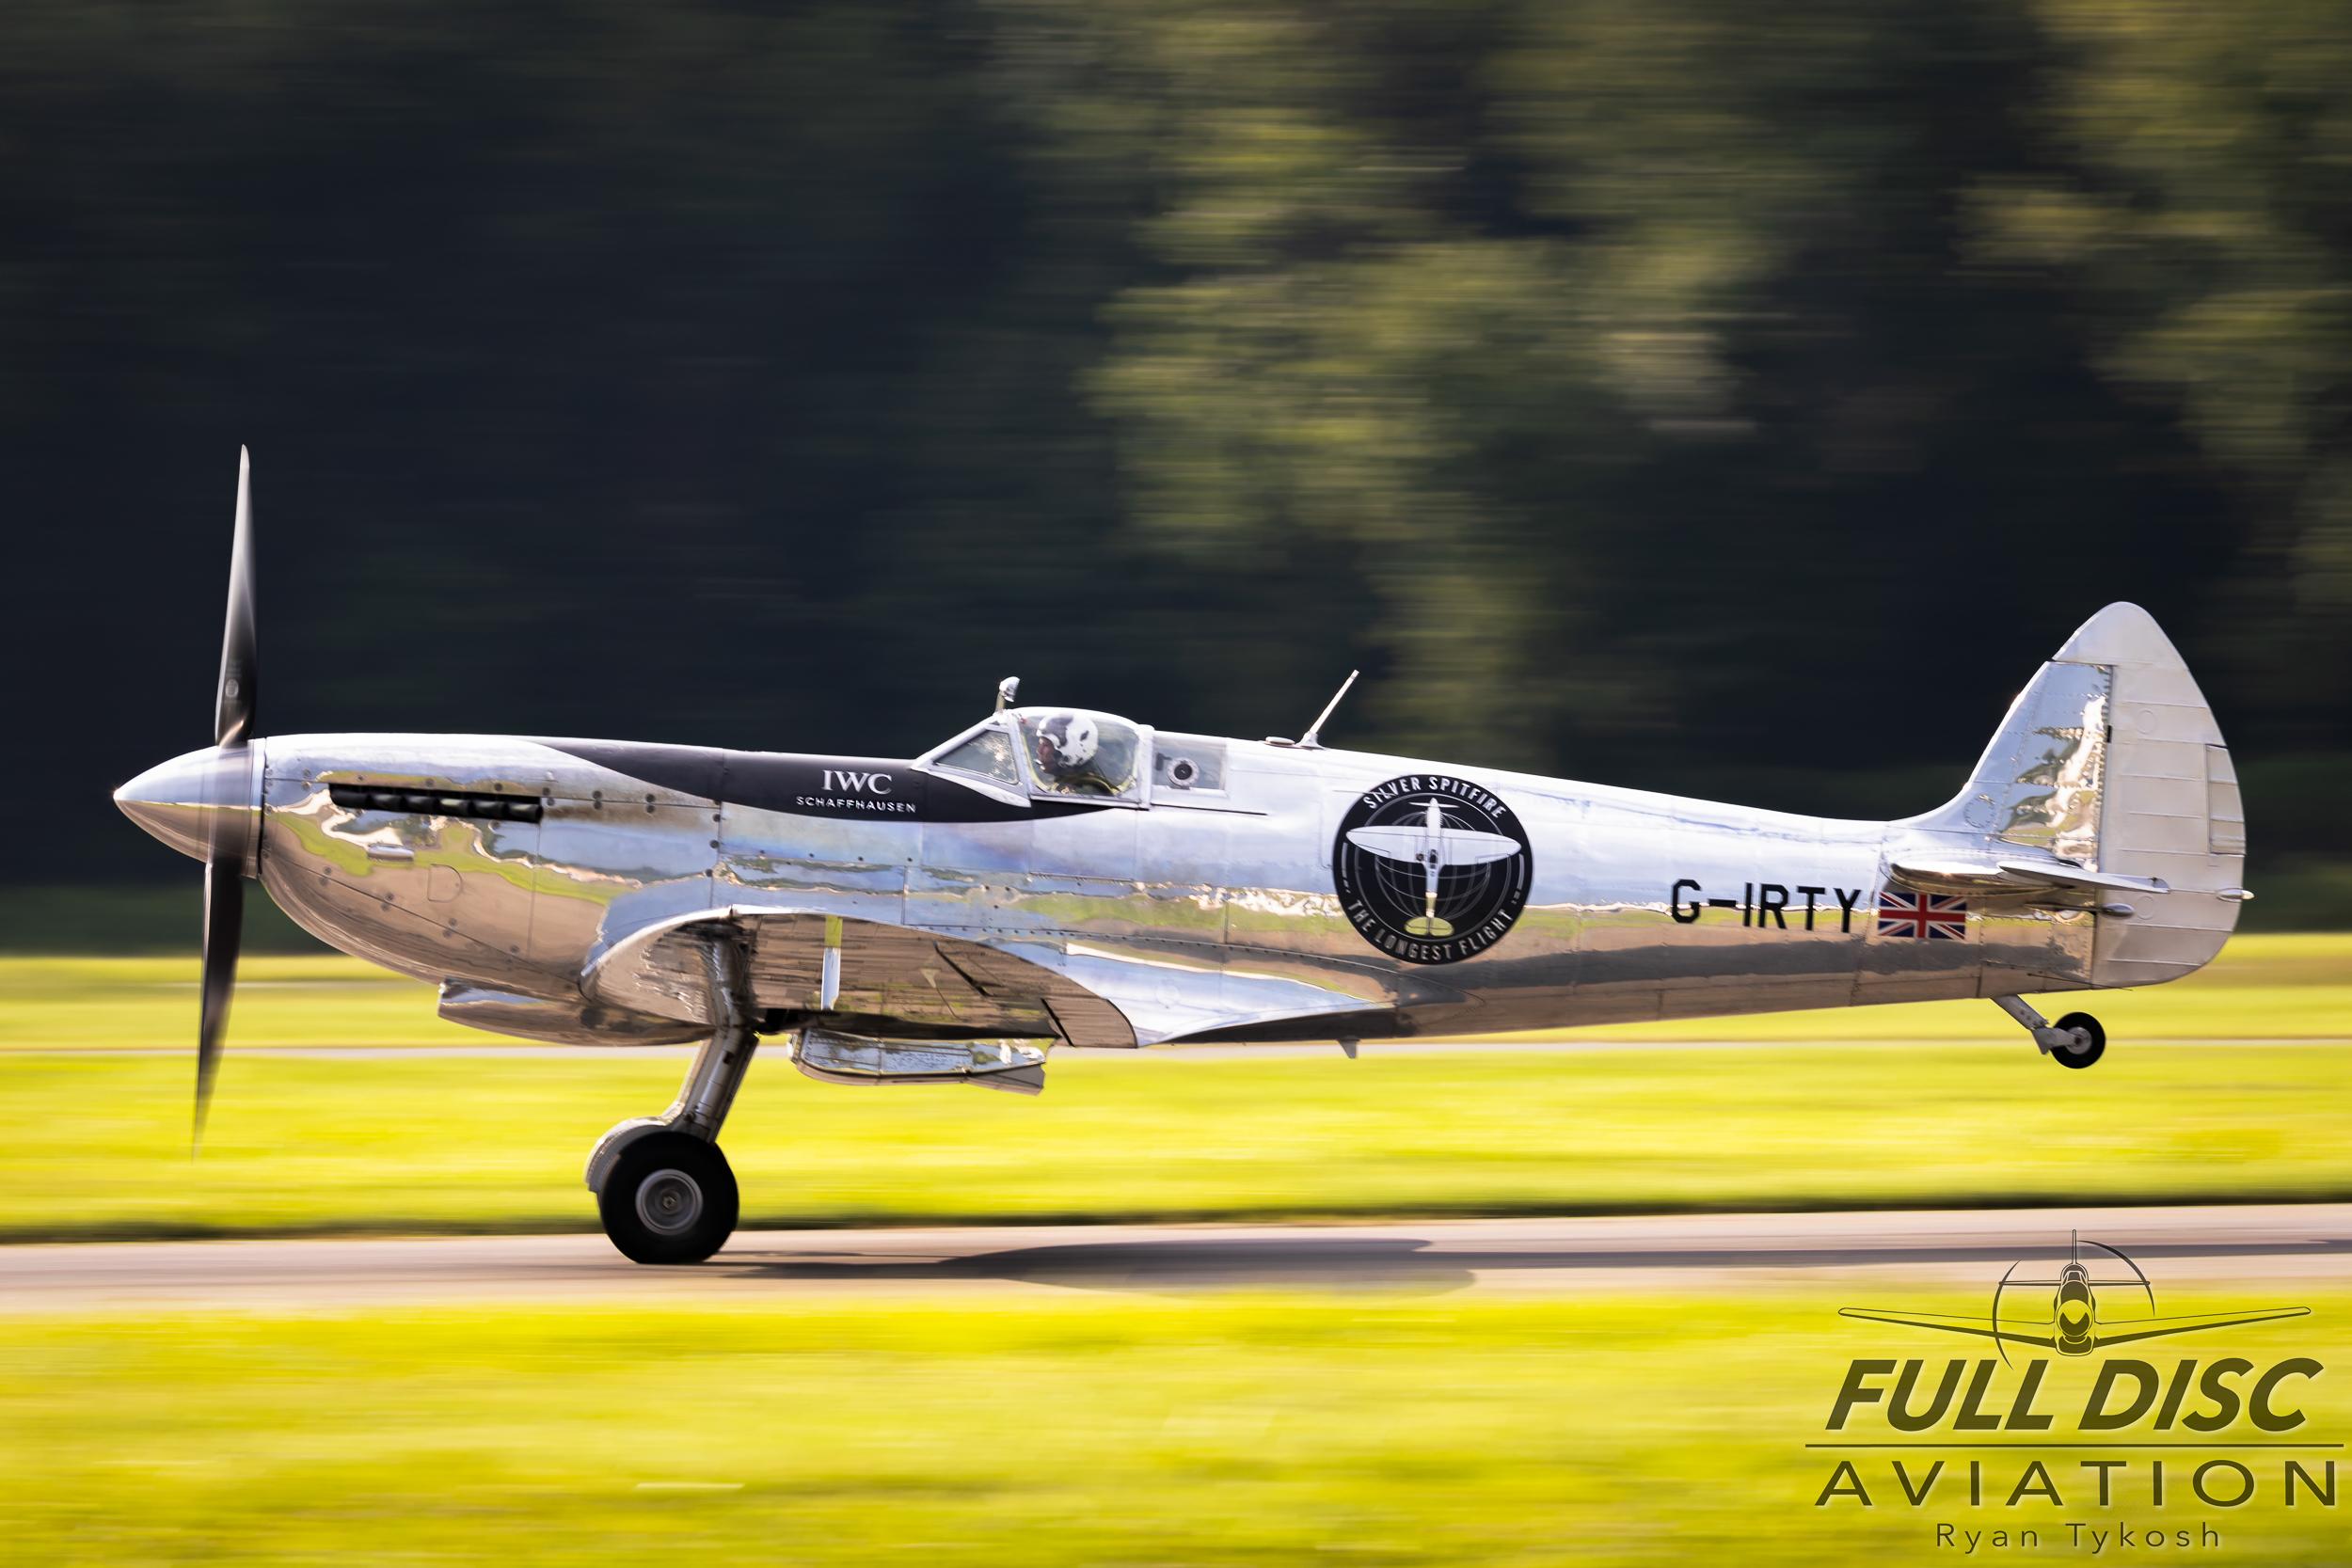 Silver Spitfire - Full Disc Aviation - Ryan Tykosh_August 21, 2019_08.jpg